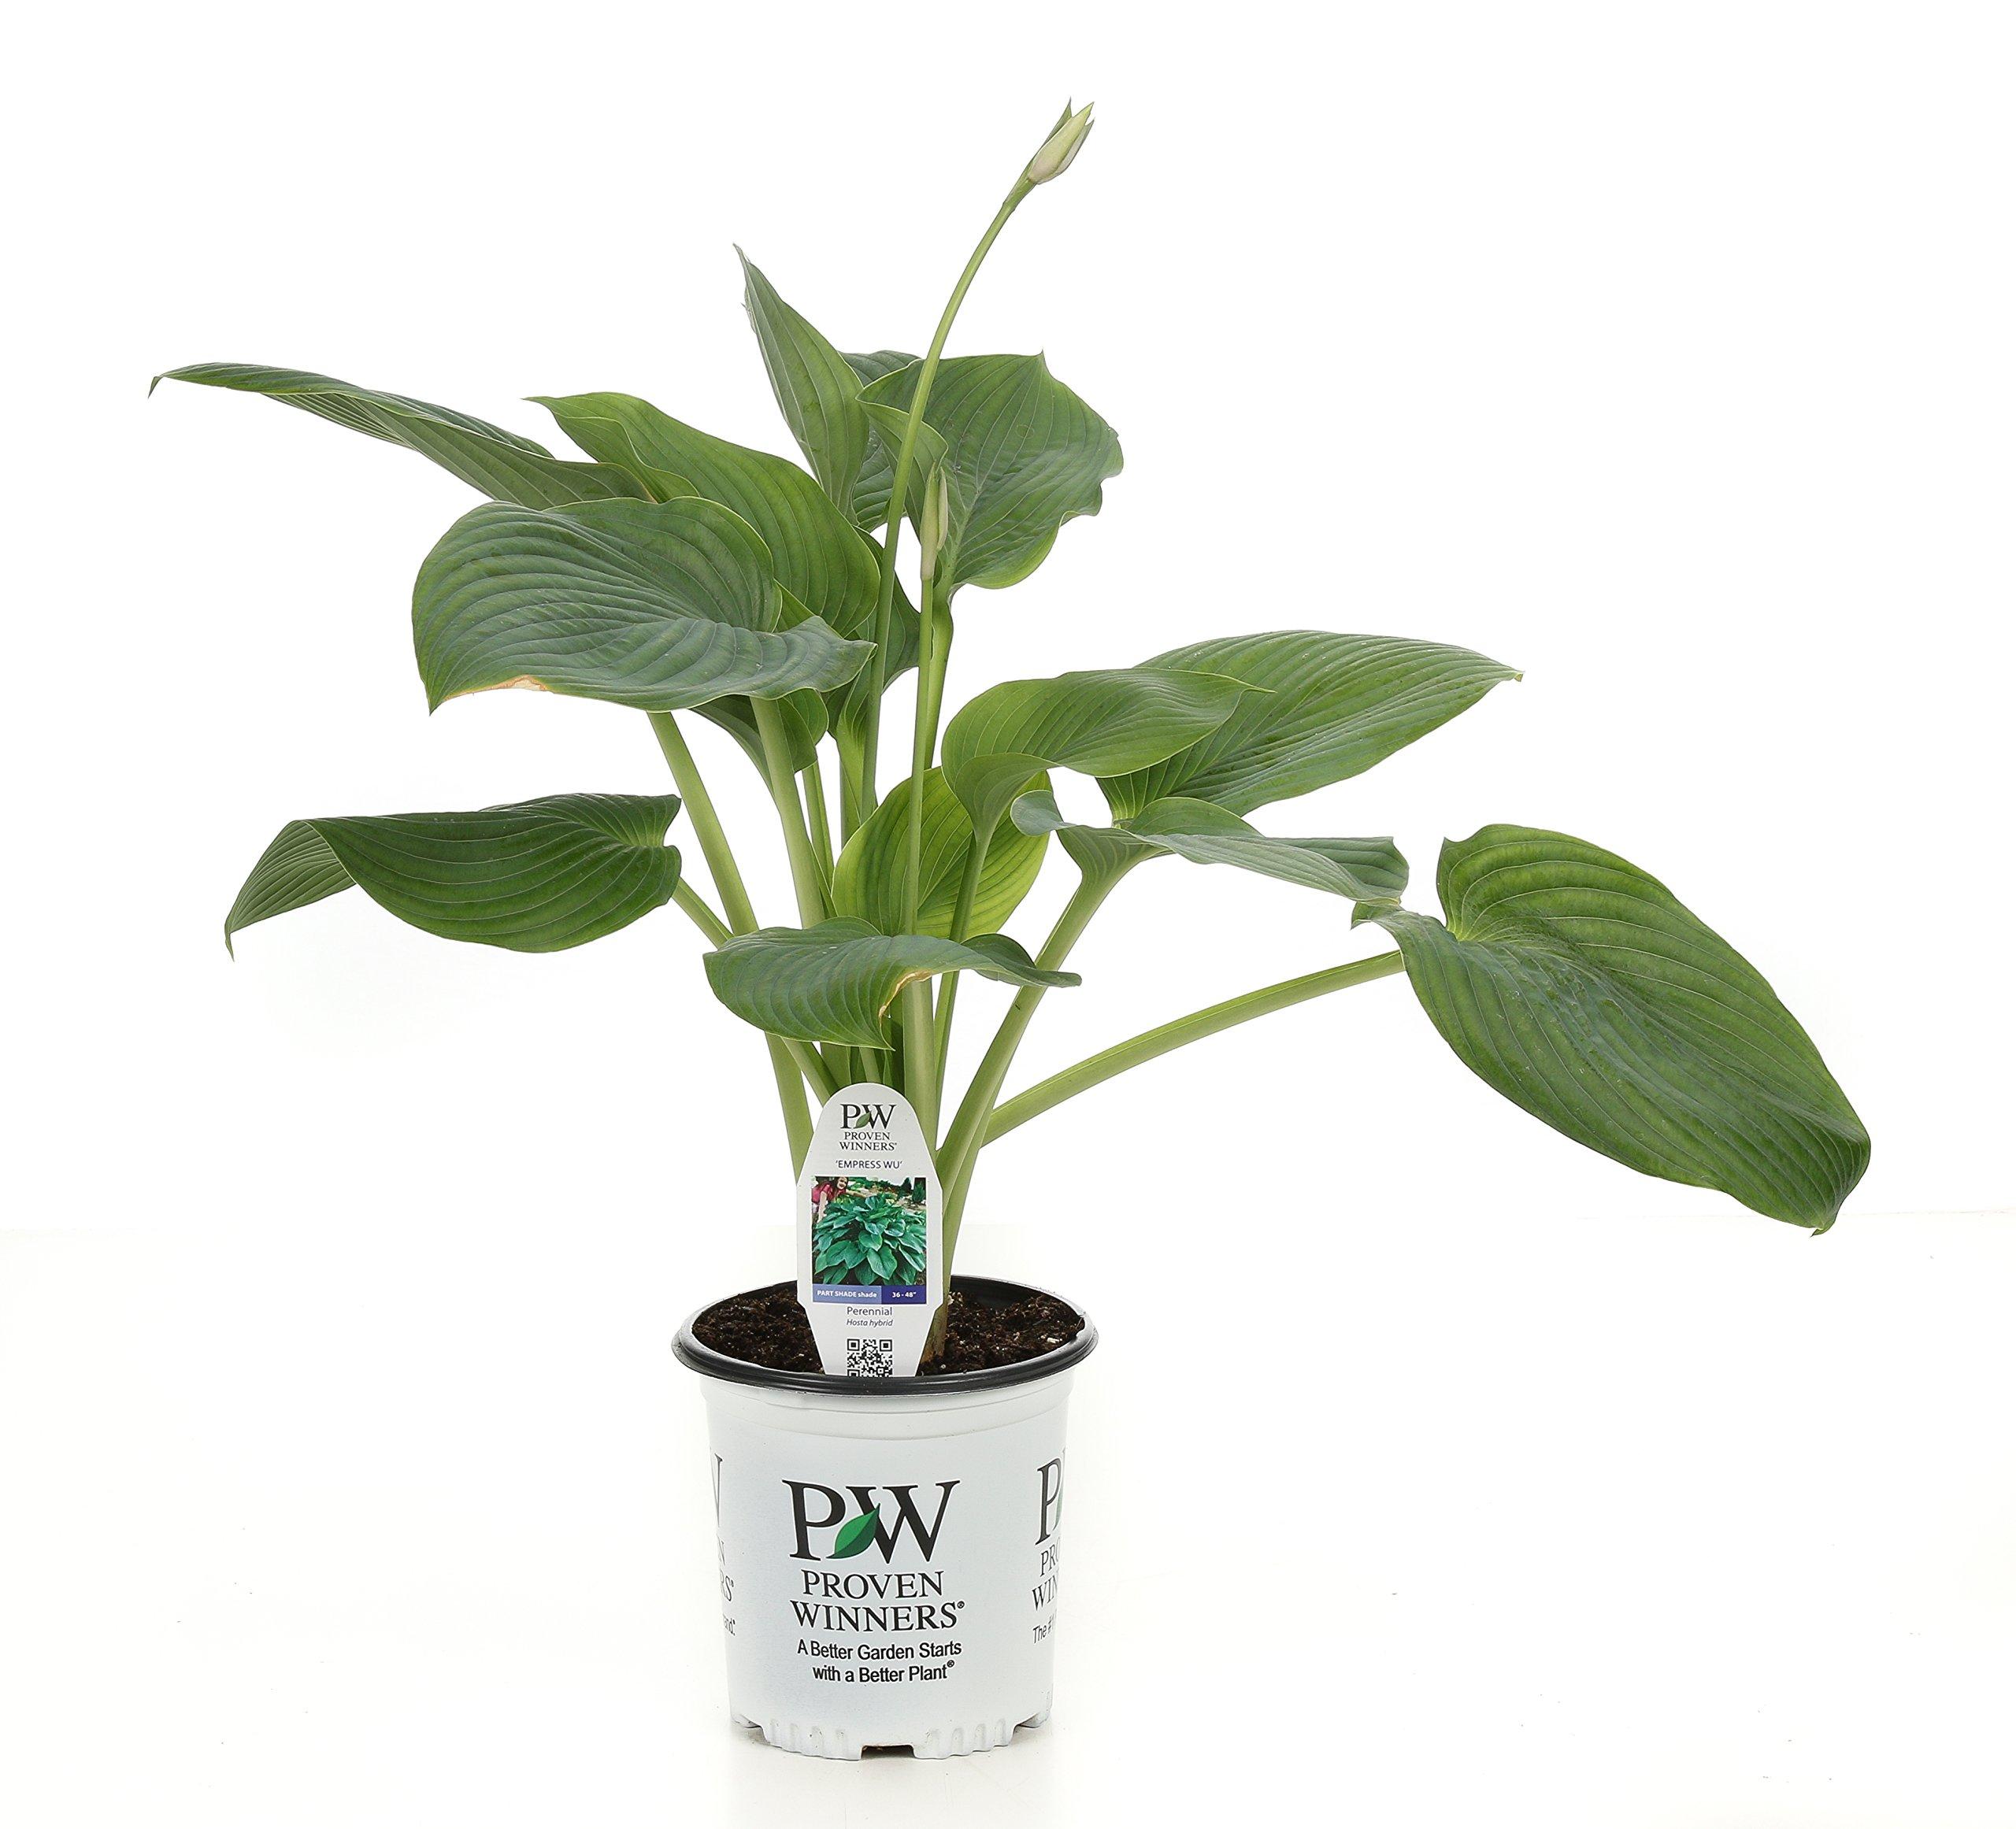 Shadowland Empress Wu (Hosta) Live Plant, Green Foliage, 0.65 Gallon by Proven Winners (Image #1)